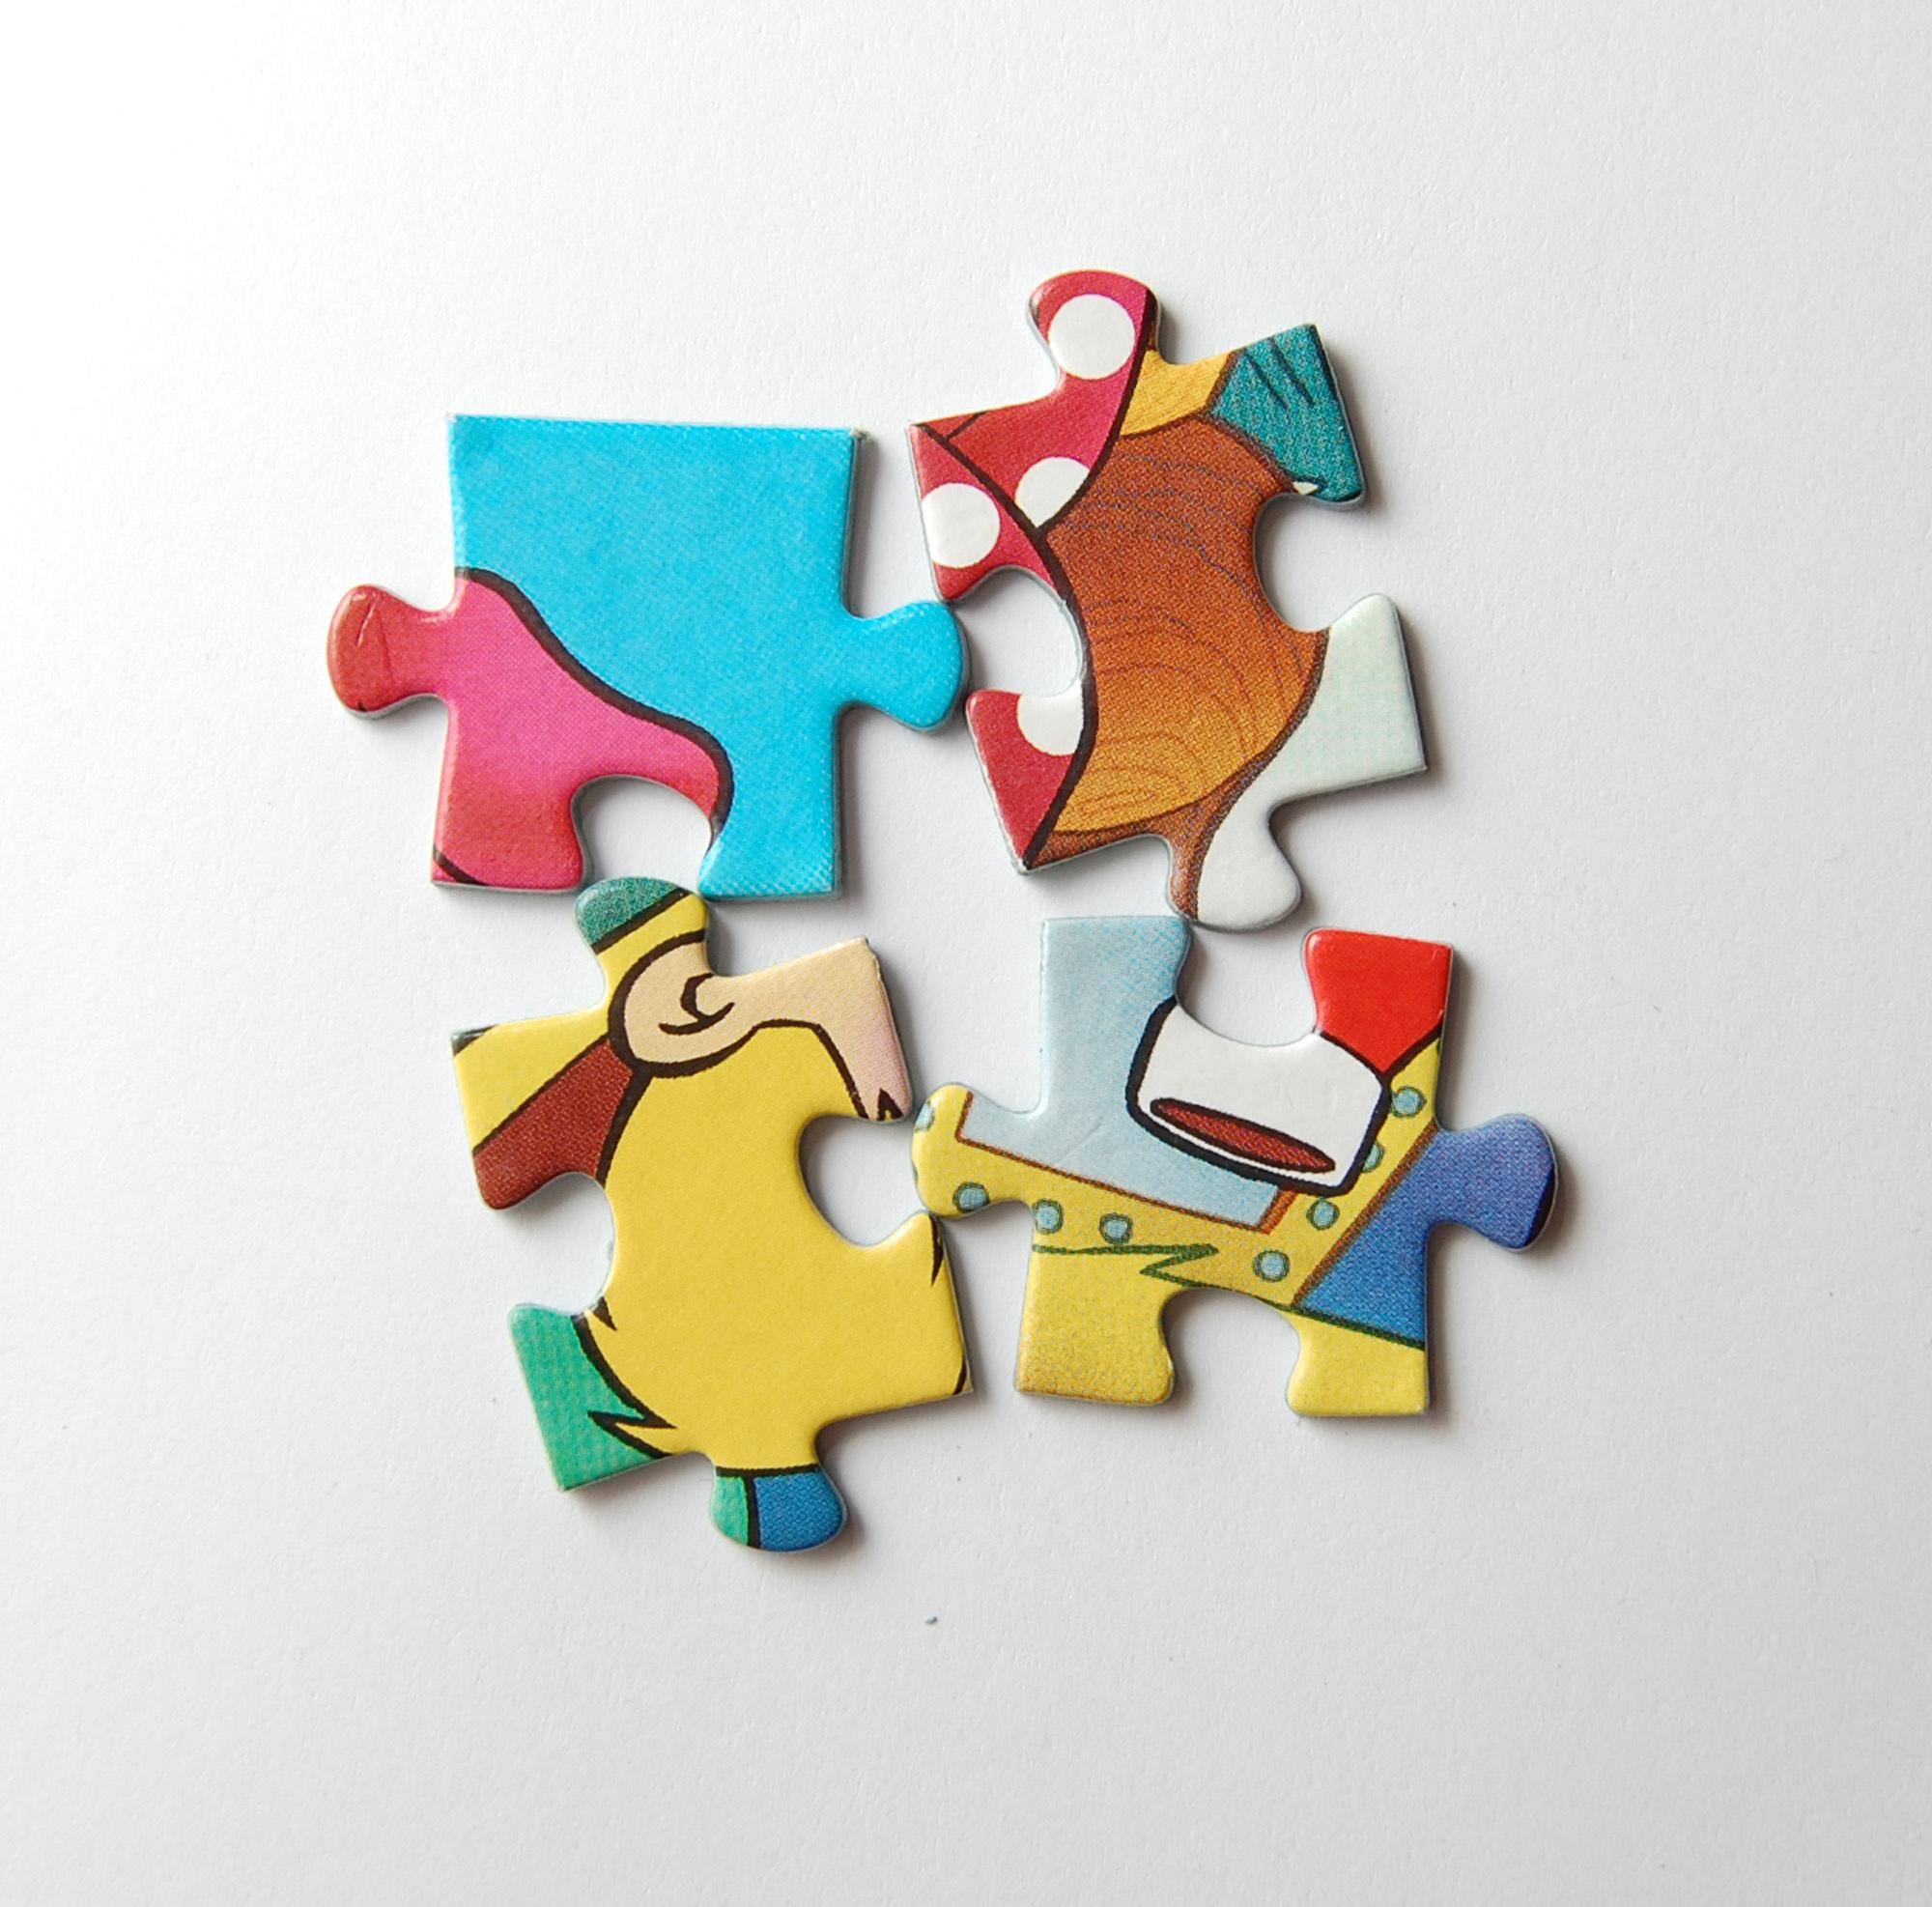 Jig Puzzle